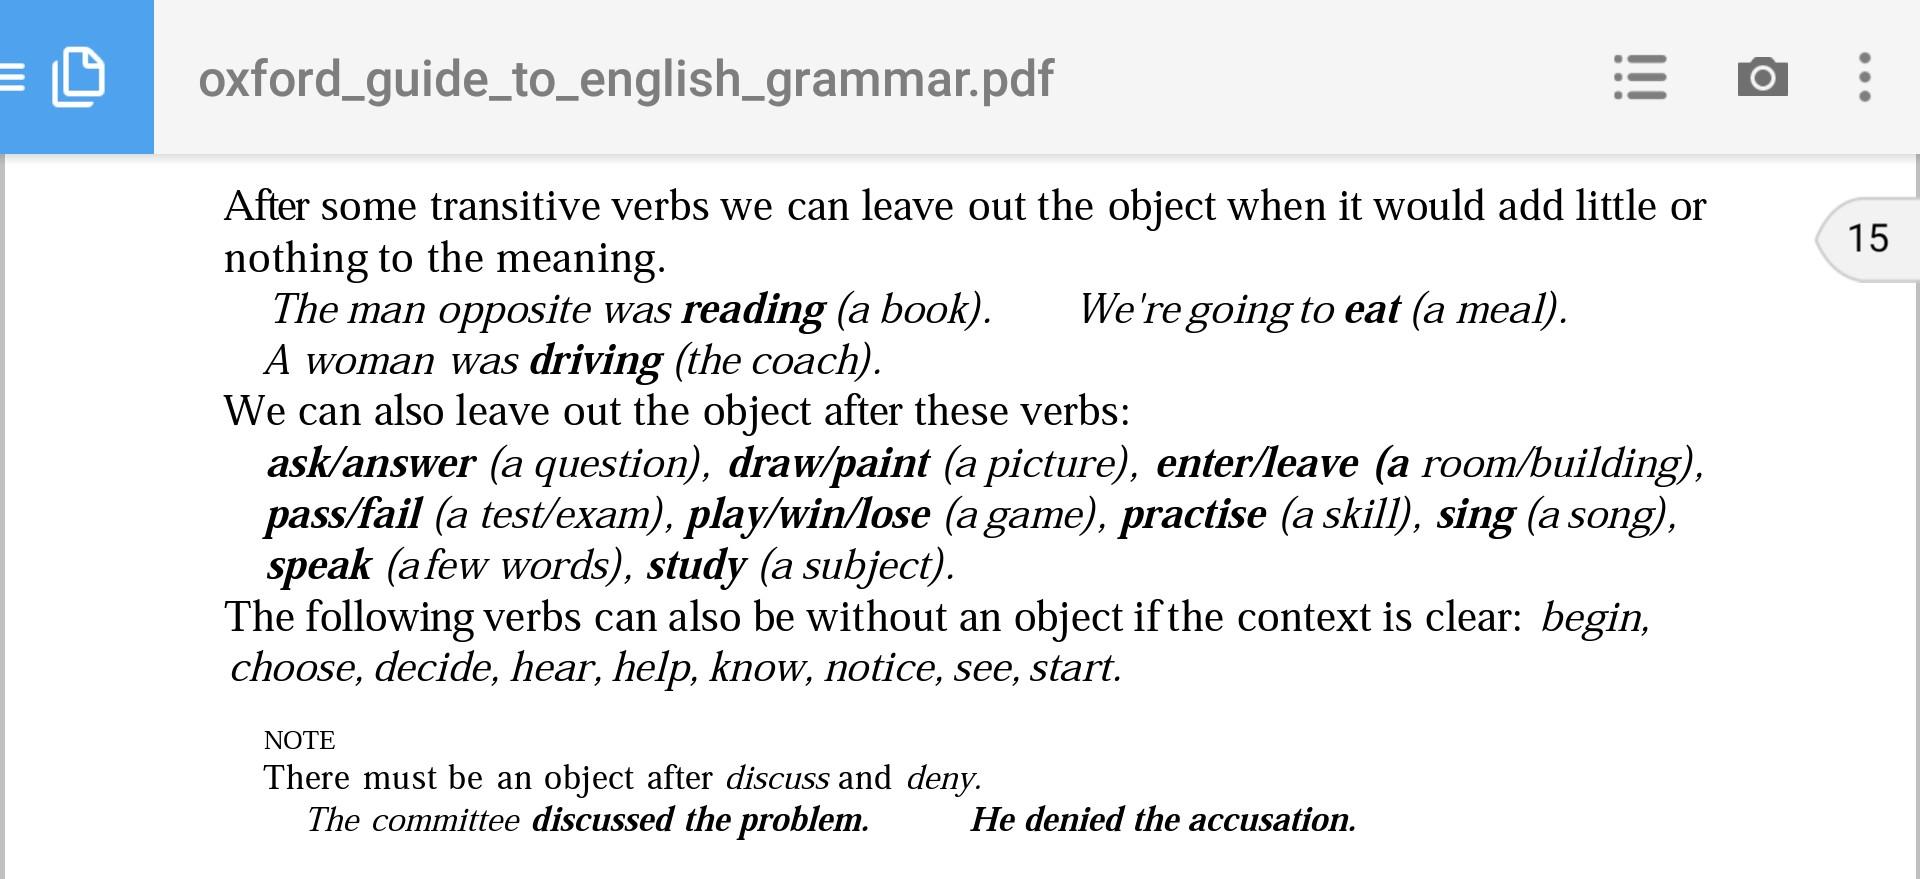 Transitive Verbs Versus Intransitive Verbs